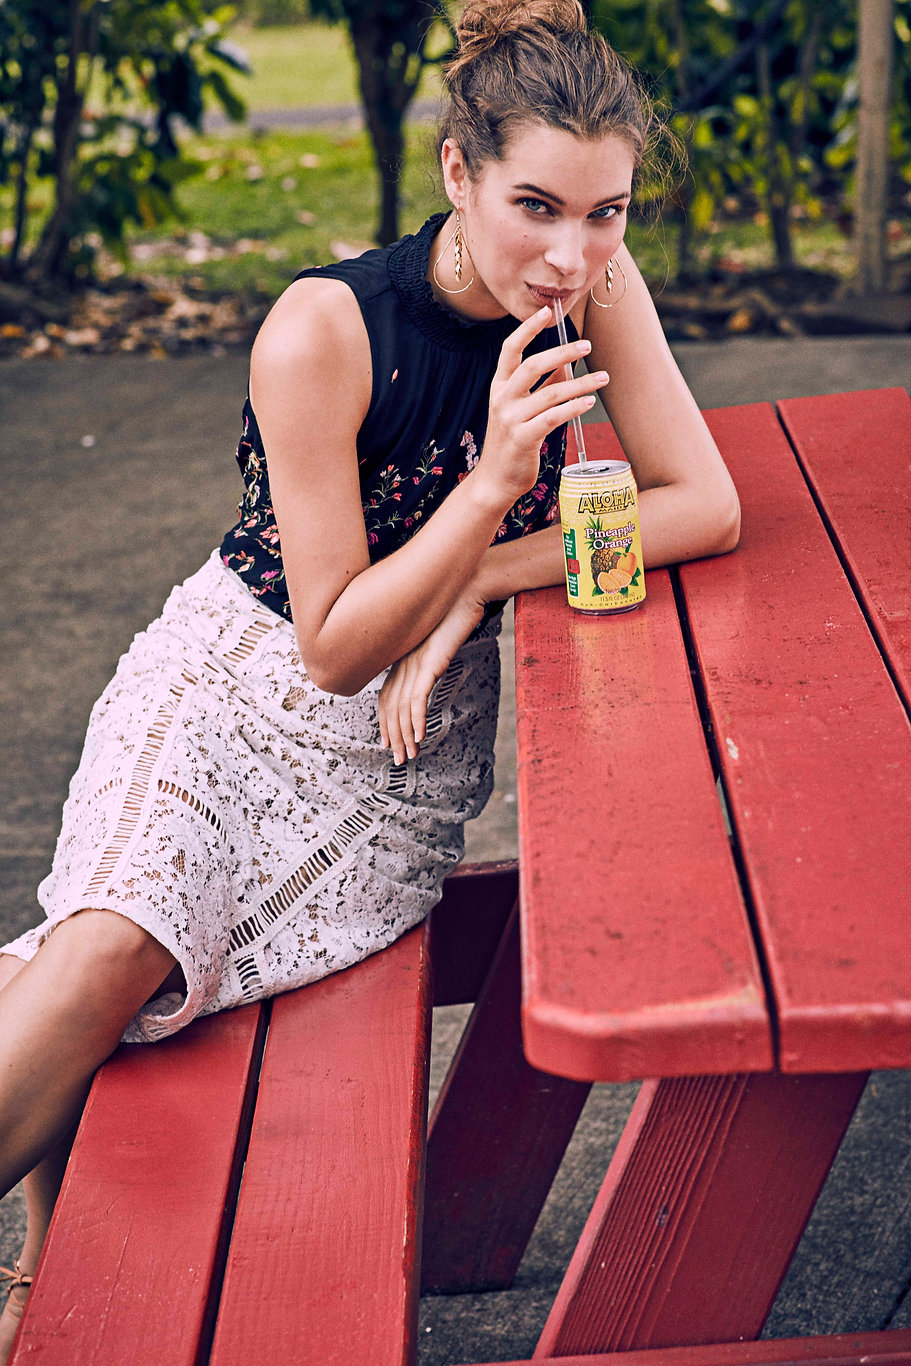 Lise Olsen Anthropologie Hawaii Swim beach bikini color hair make up soda smile laugh